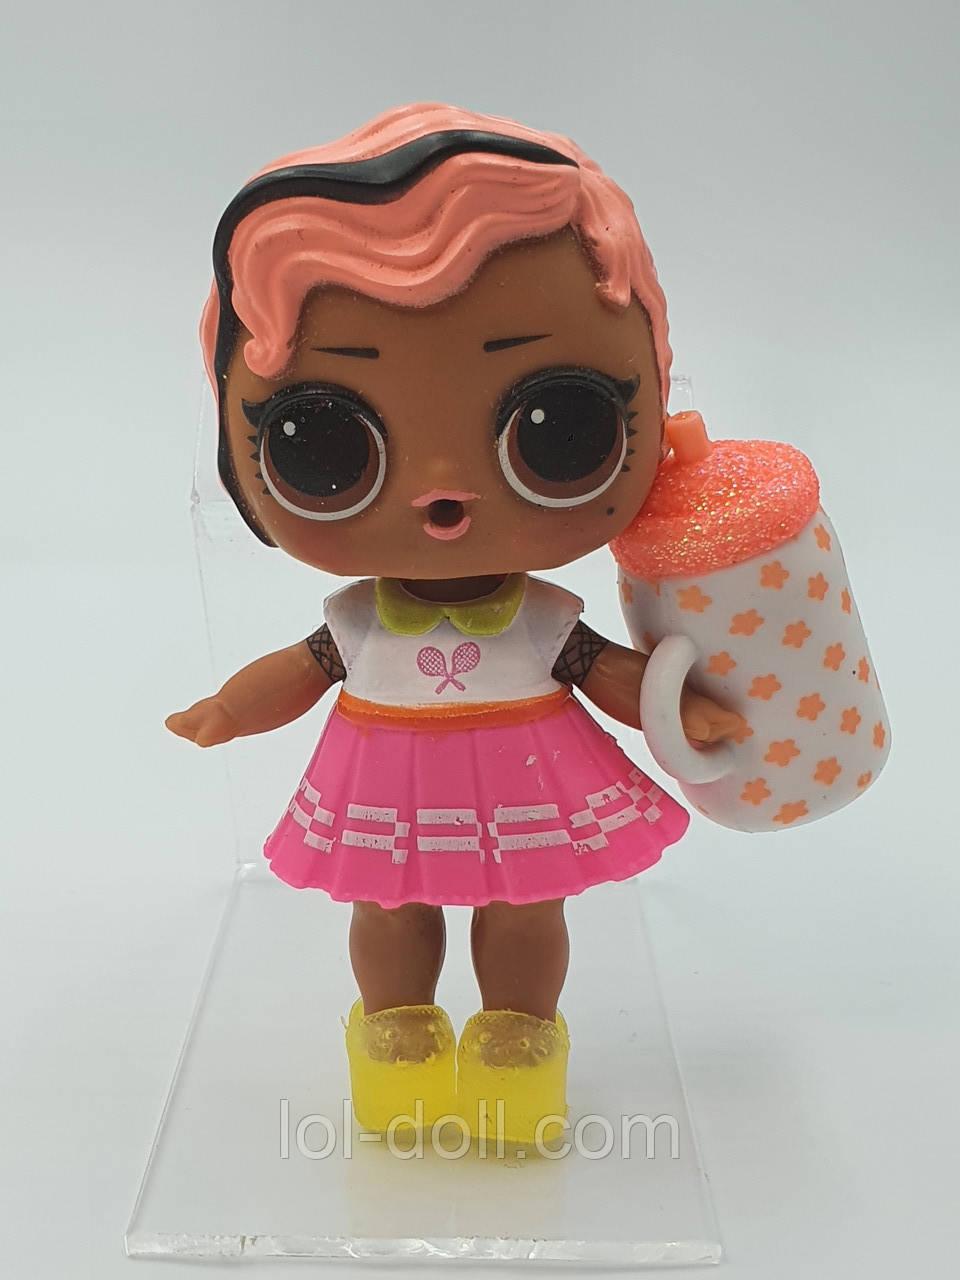 Кукла LOL Surprise Special Series Strut Лол Сюрприз Без Шара Оригинал